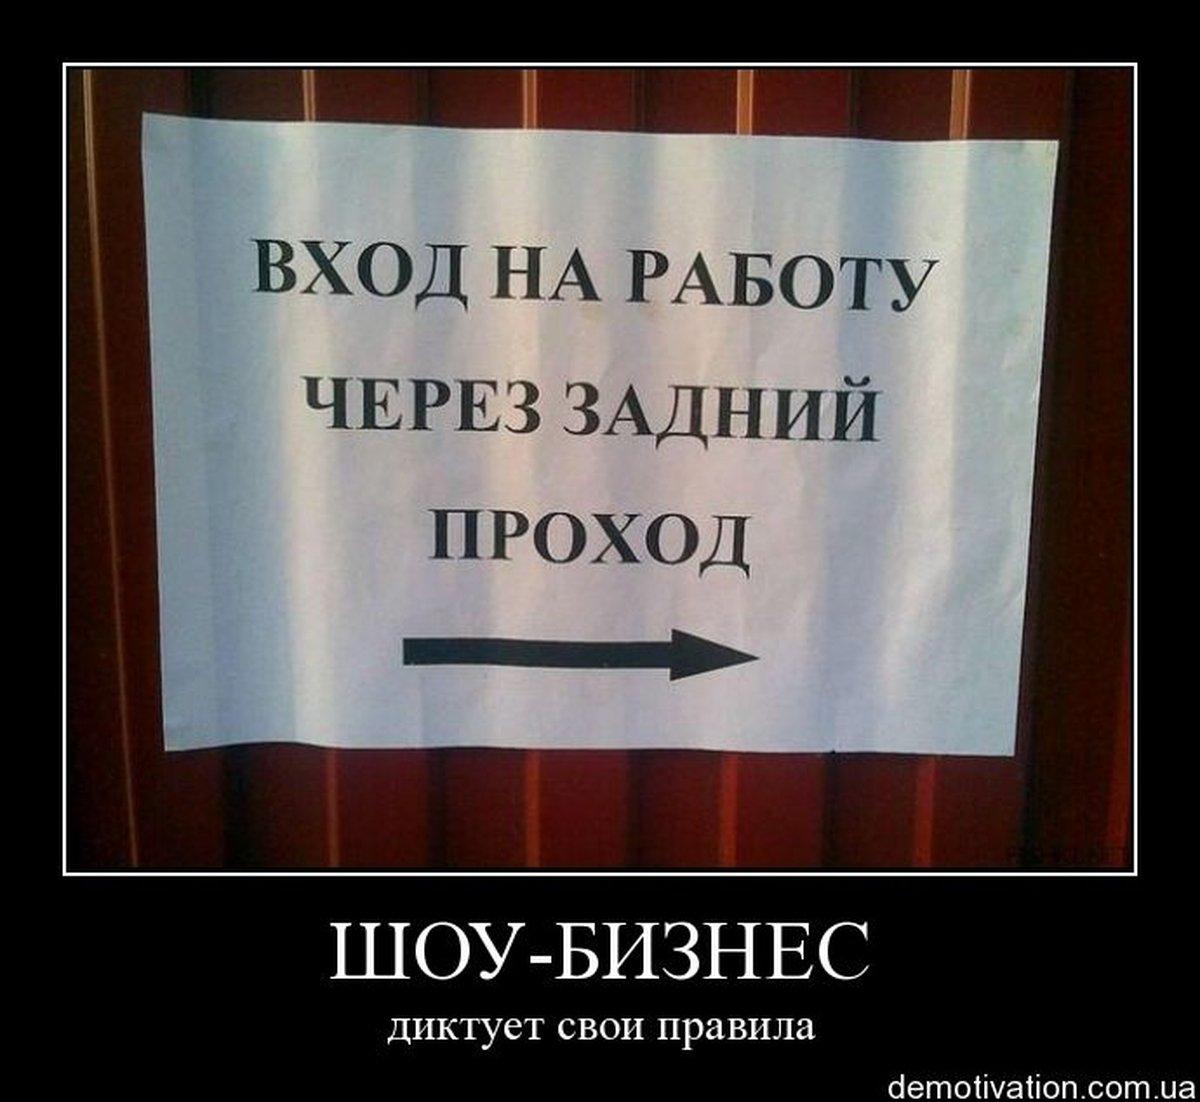 Картинки с приколами на работе, открытка видом кремля